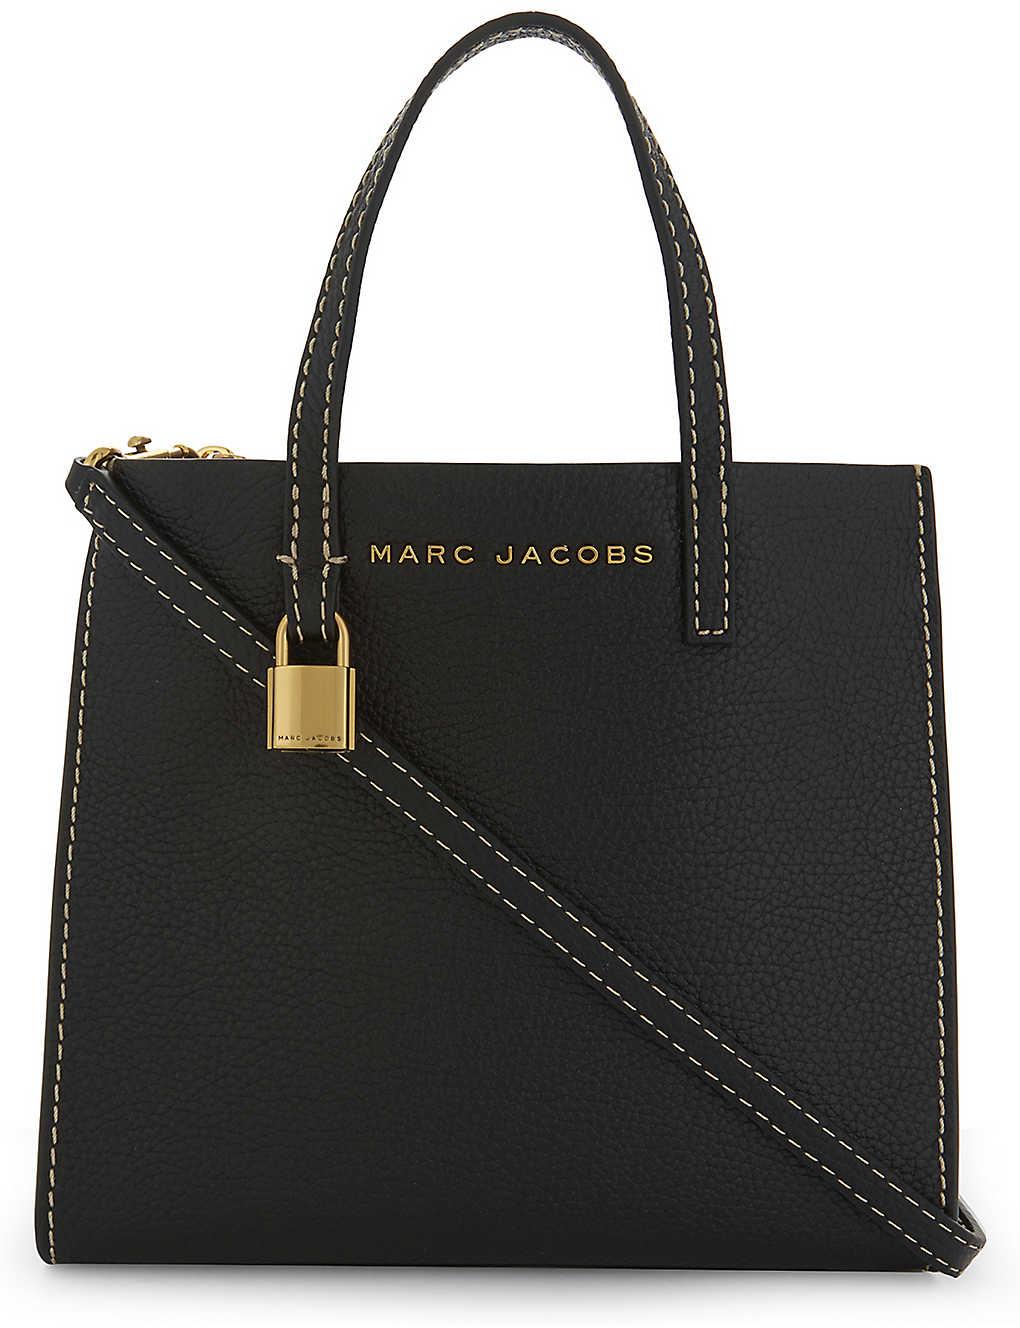 9110056bdc14 MARC JACOBS - Mini Grind tote bag